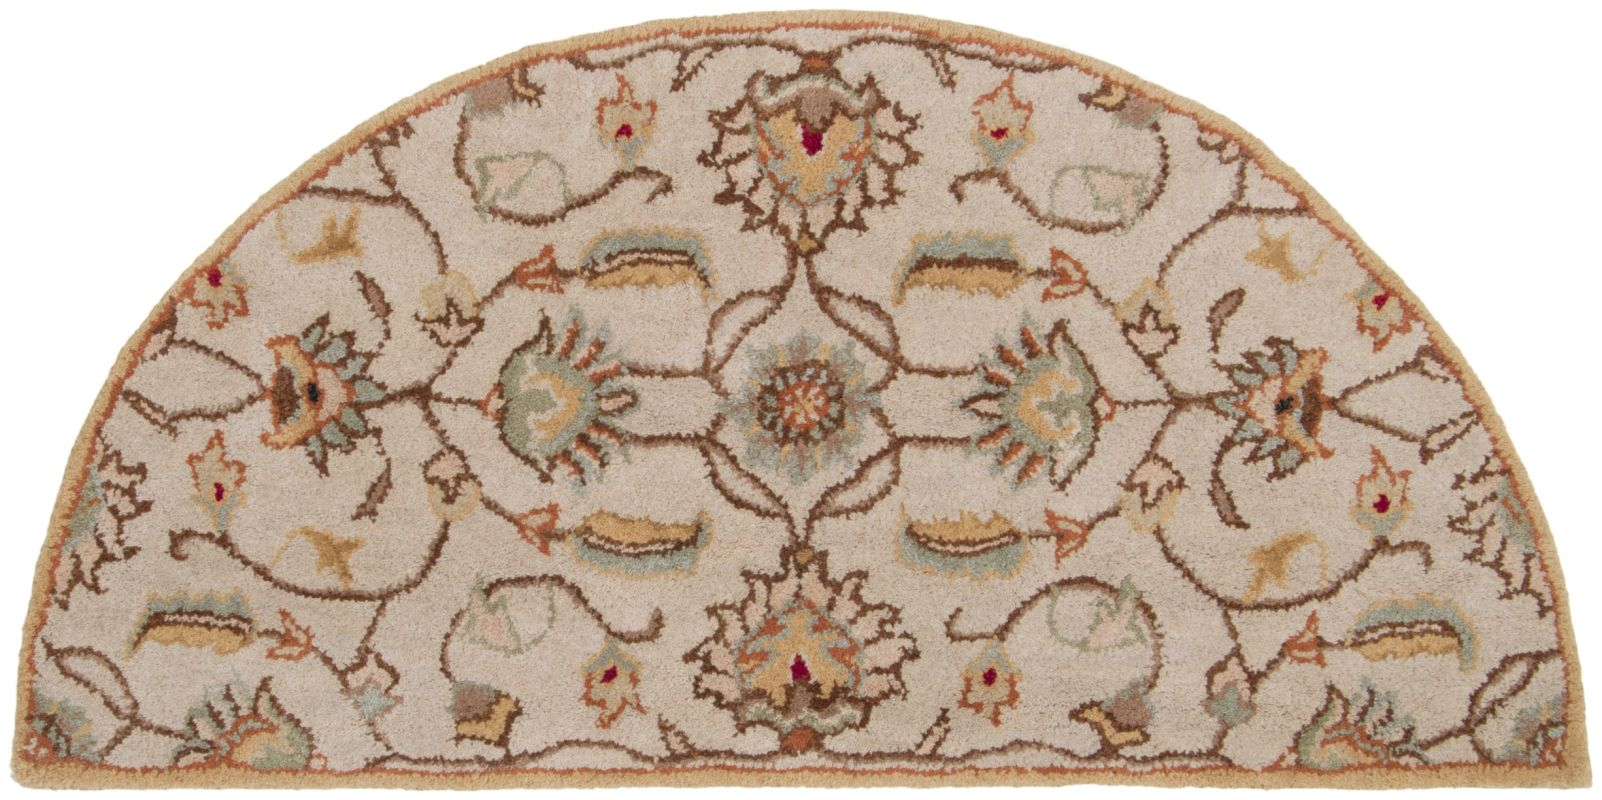 Surya CAE-1029 Caesar Hand Tufted Wool Rug Off-White 2 x 4 Hearth Home